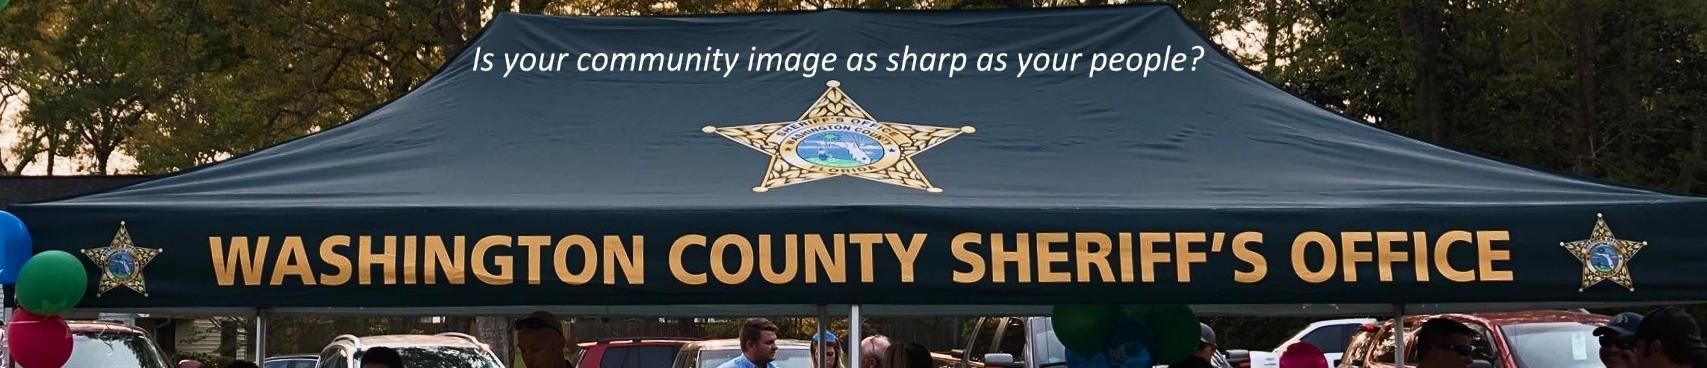 Washington Sheriff Tent